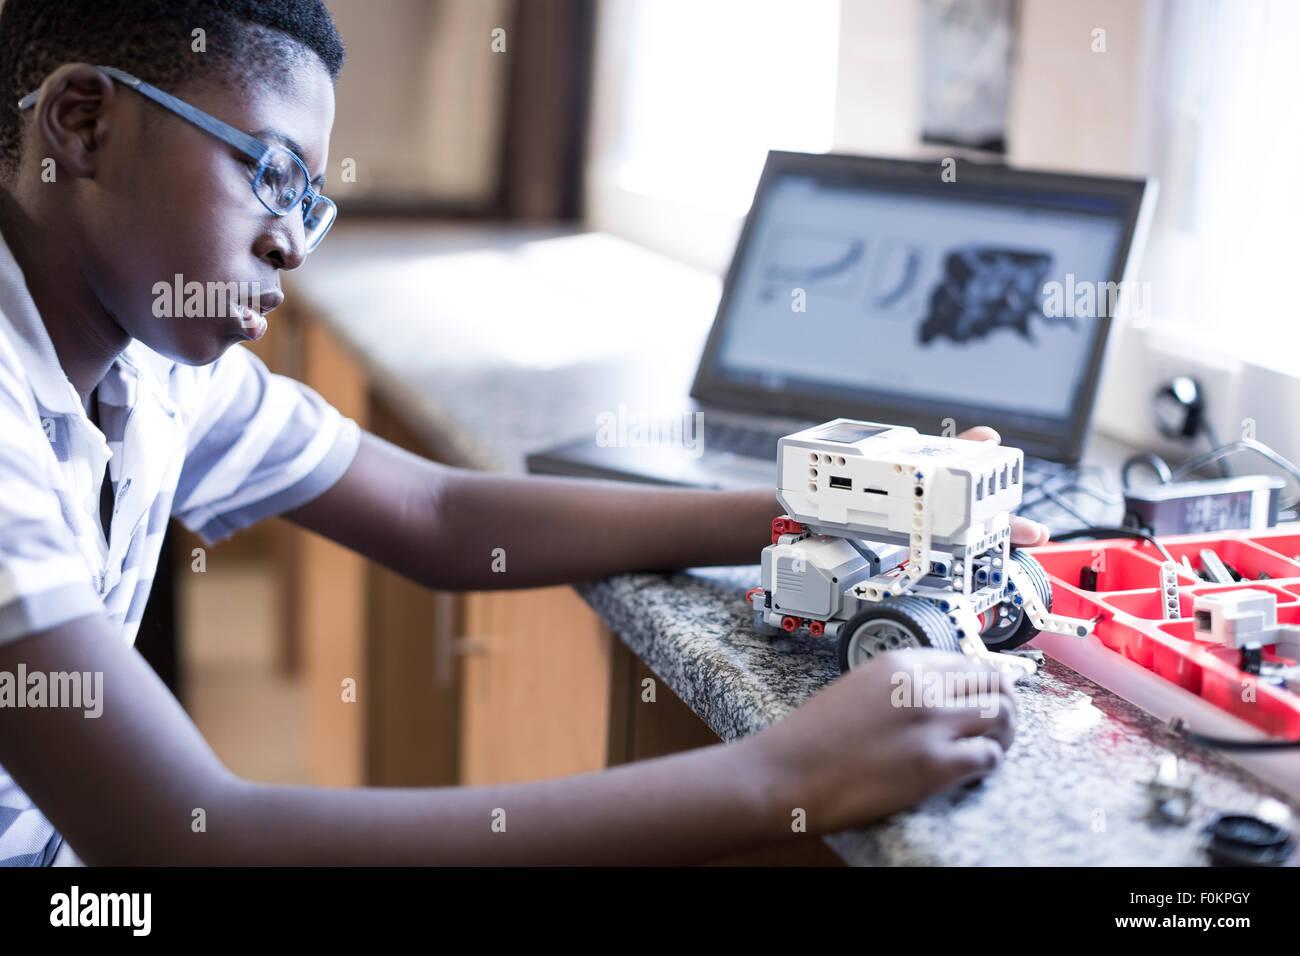 Schoolboy with laptop in robotics class - Stock Image